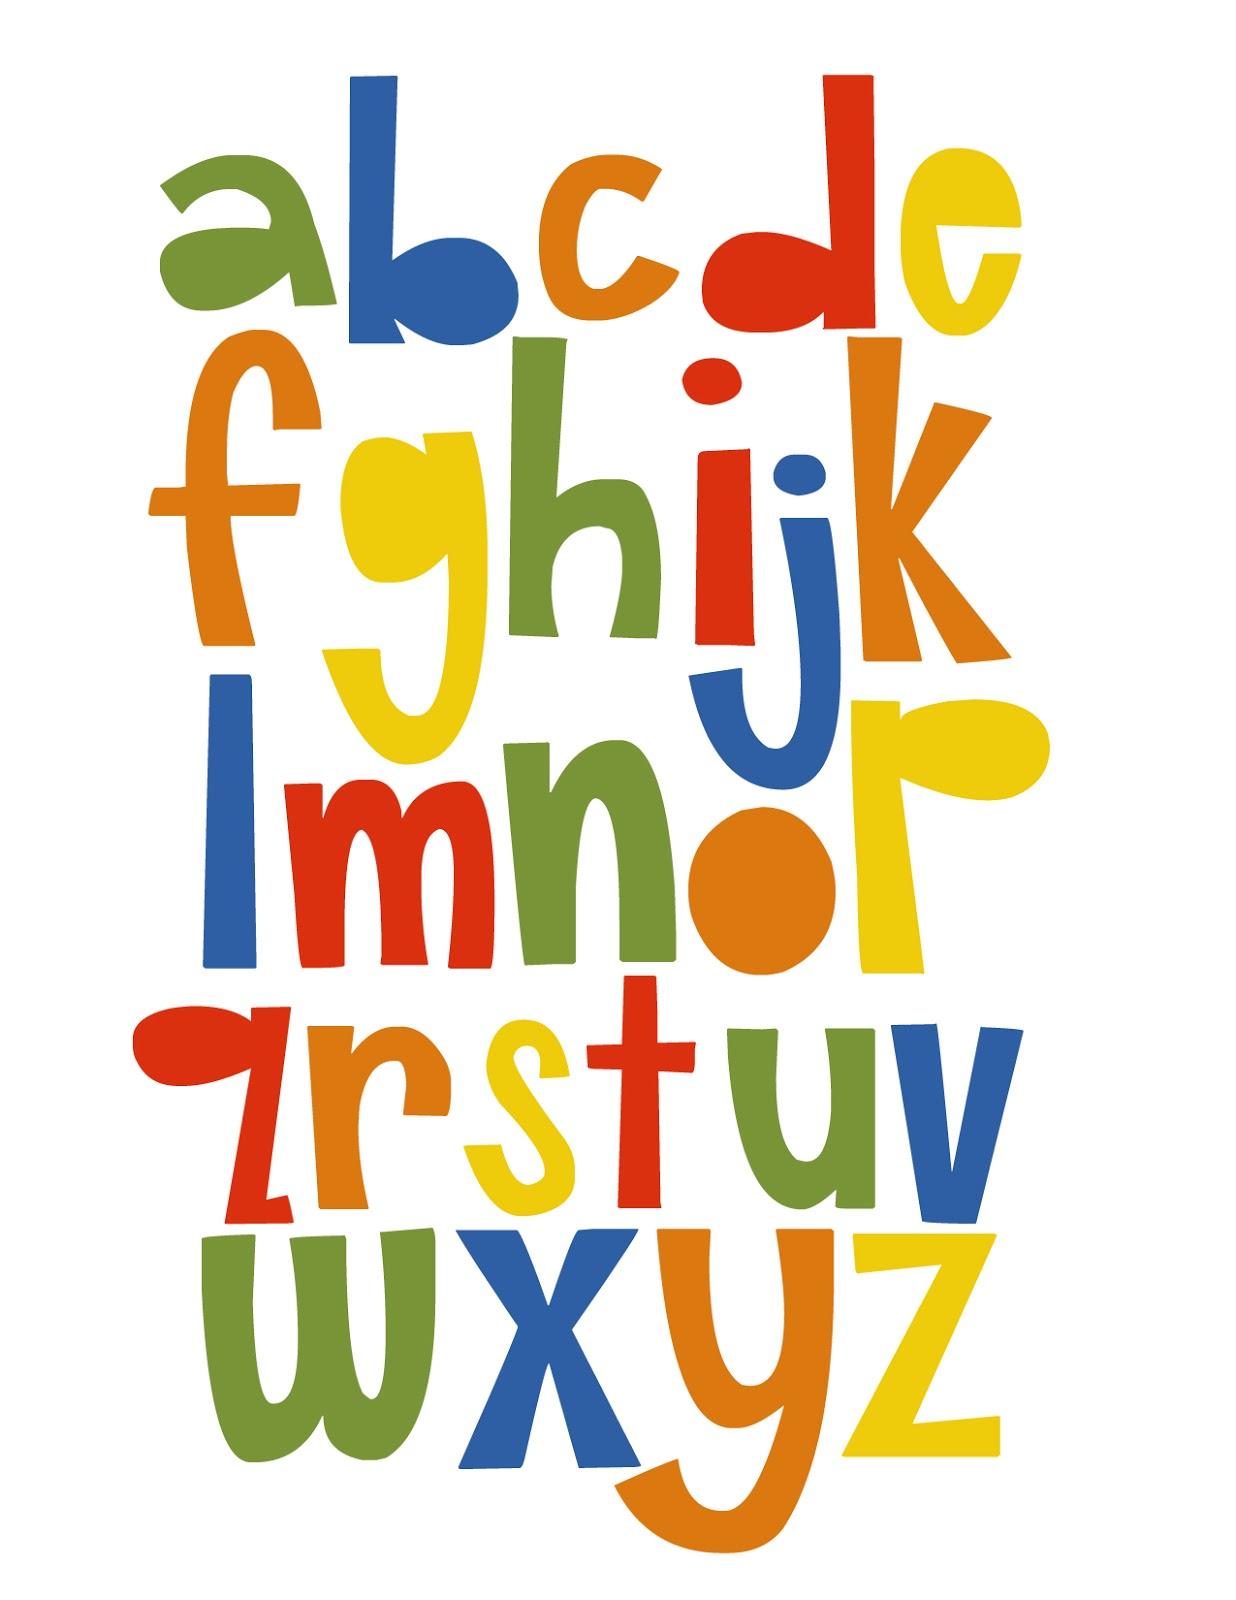 http://jen-gallacher.mybigcommerce.com/alphabet-printable/